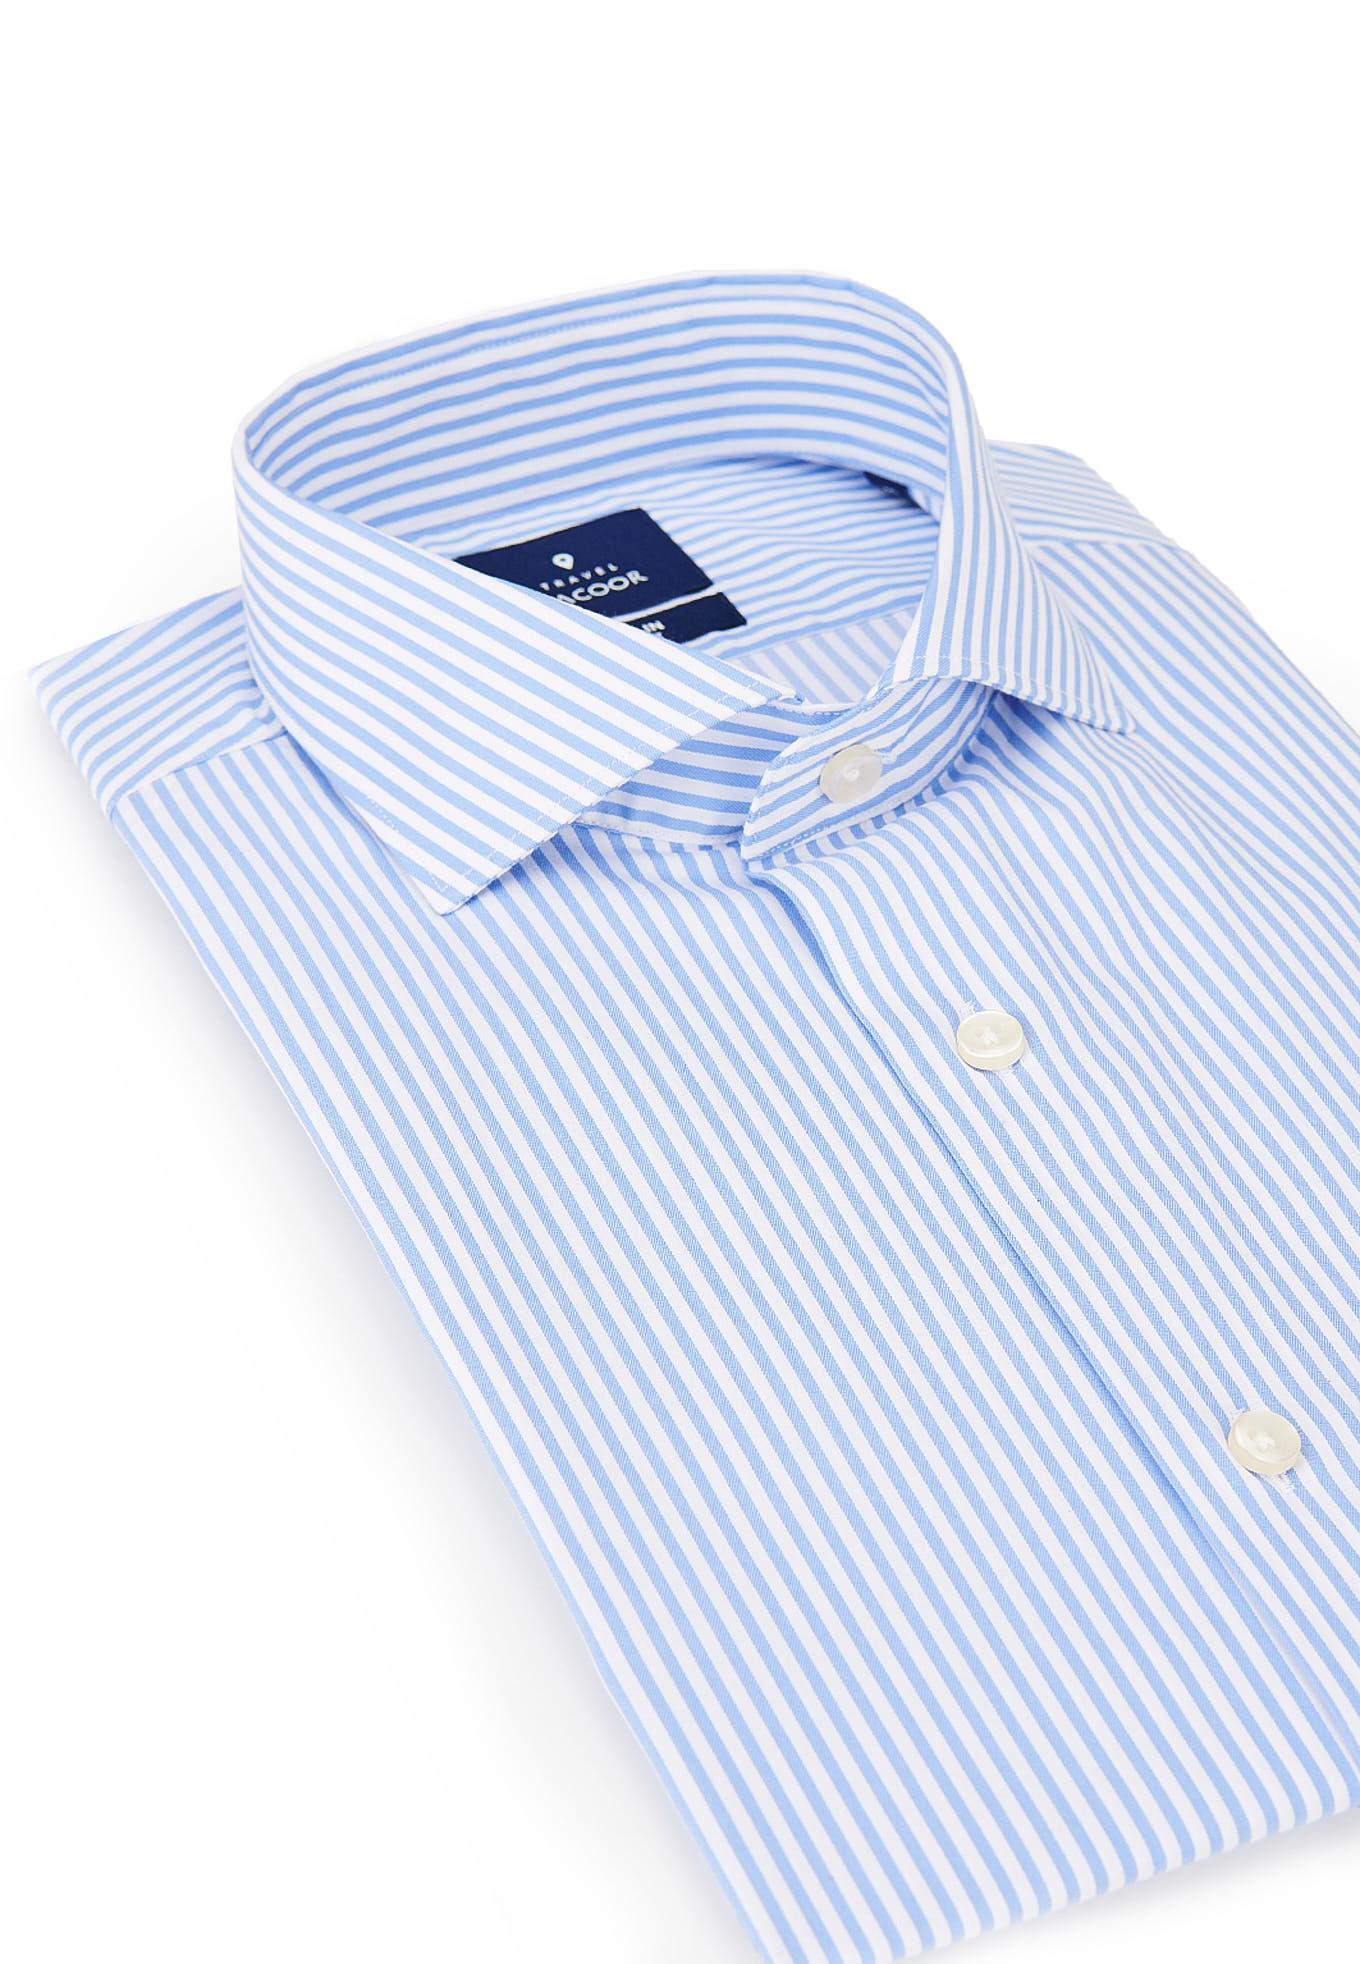 Camisa Azul Claro Formal Homem